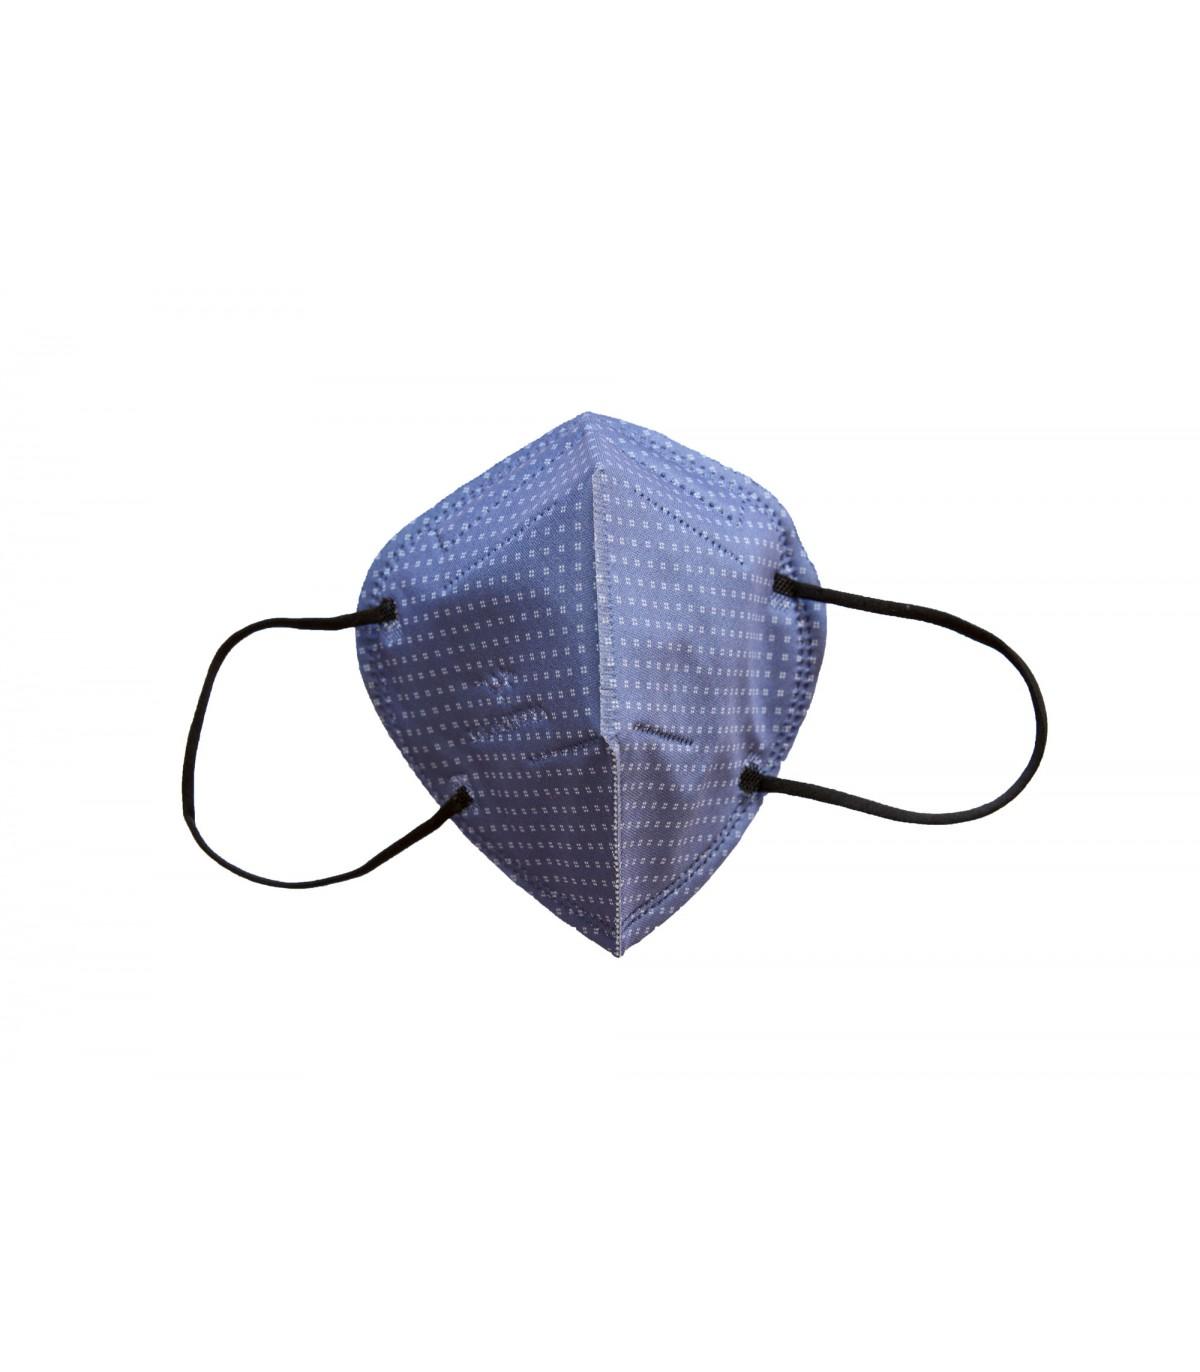 FFP2 face mask - MFNR096